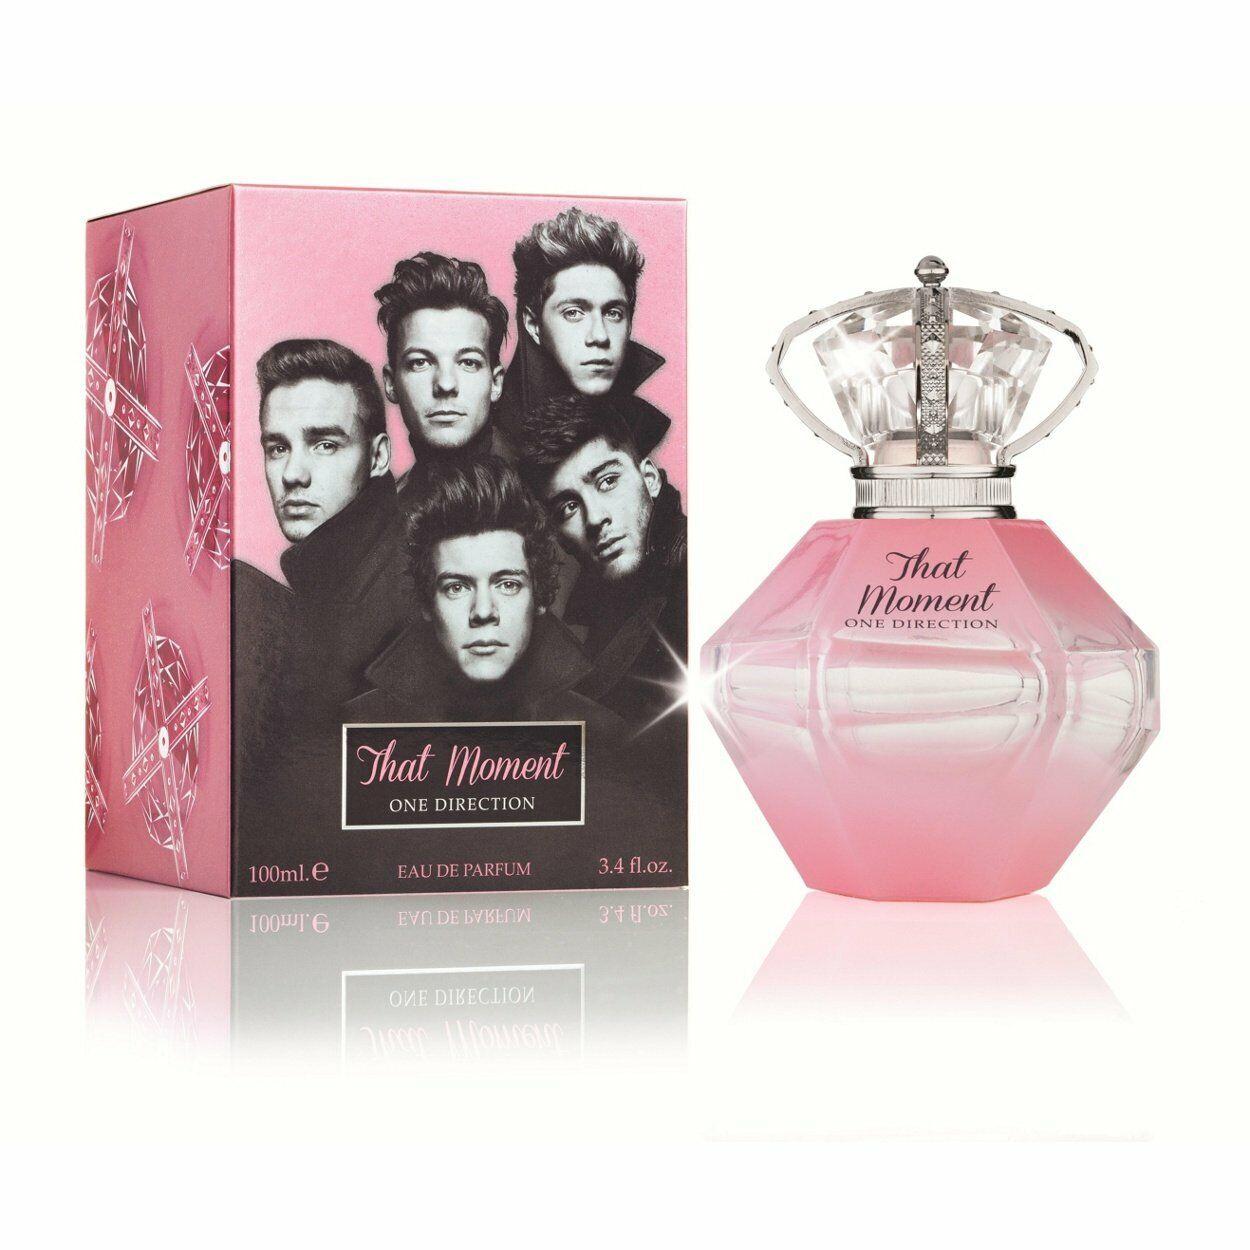 That Moment 3.4 oz EDP Perfume